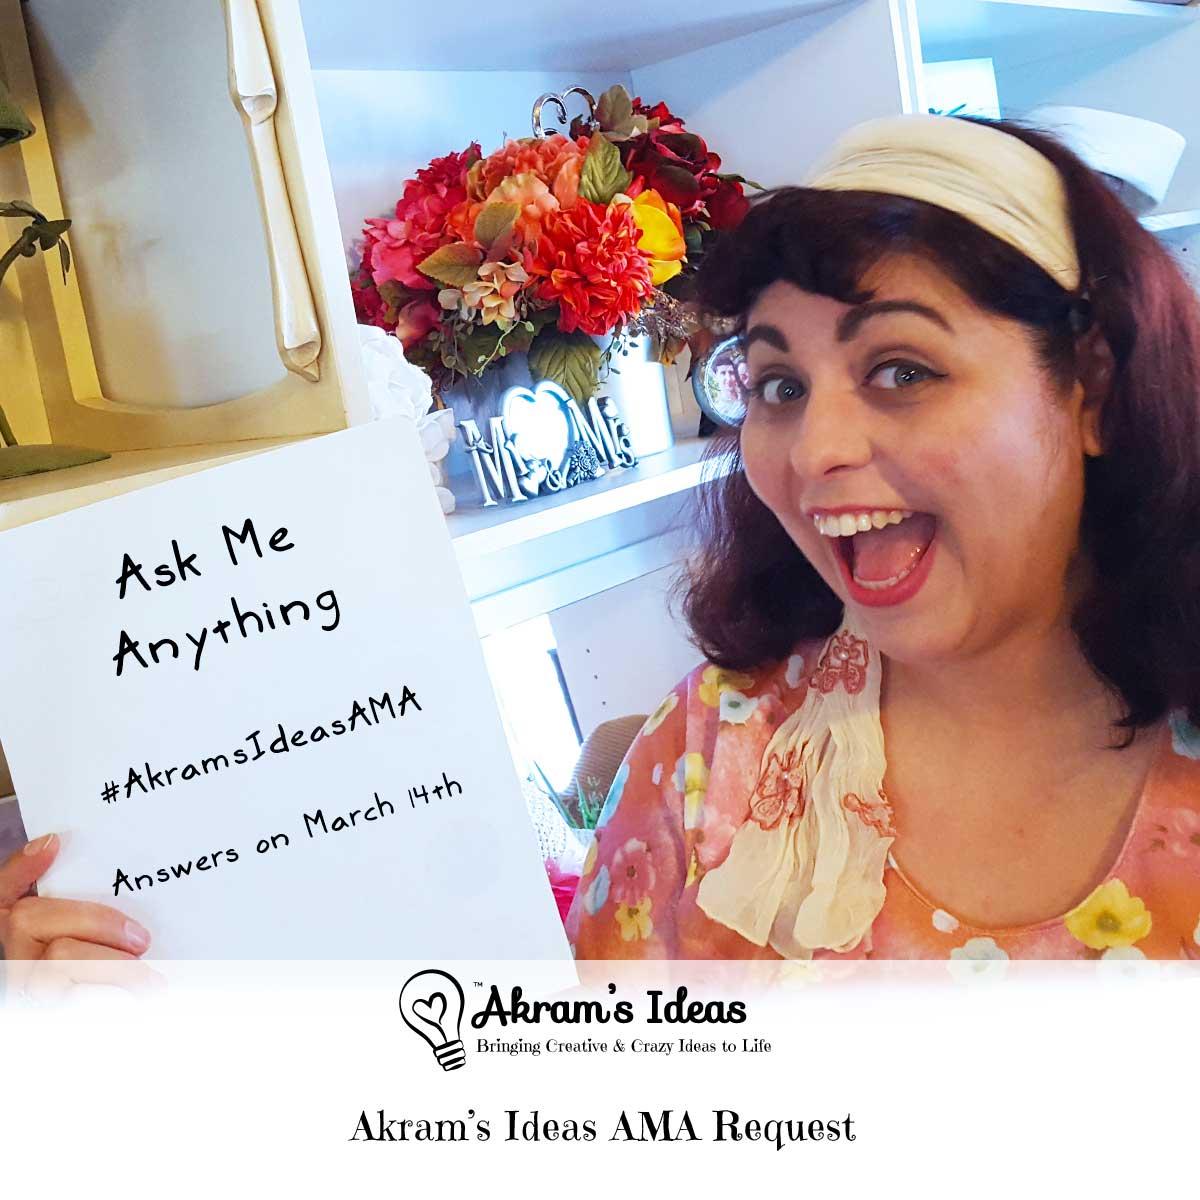 Akram's Ideas: AMA Request